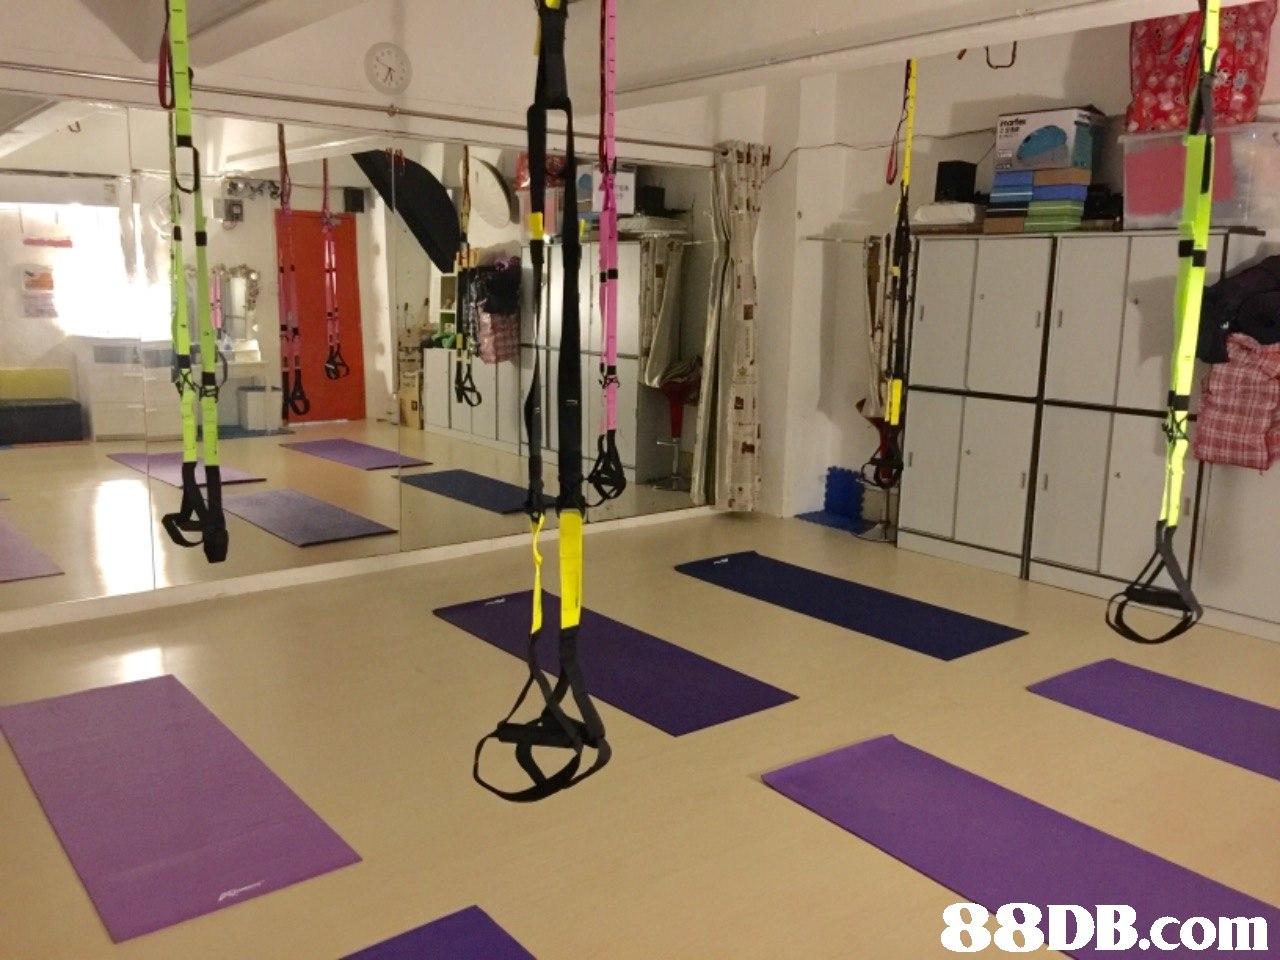 Floor,Room,Physical fitness,Flooring,Crossfit